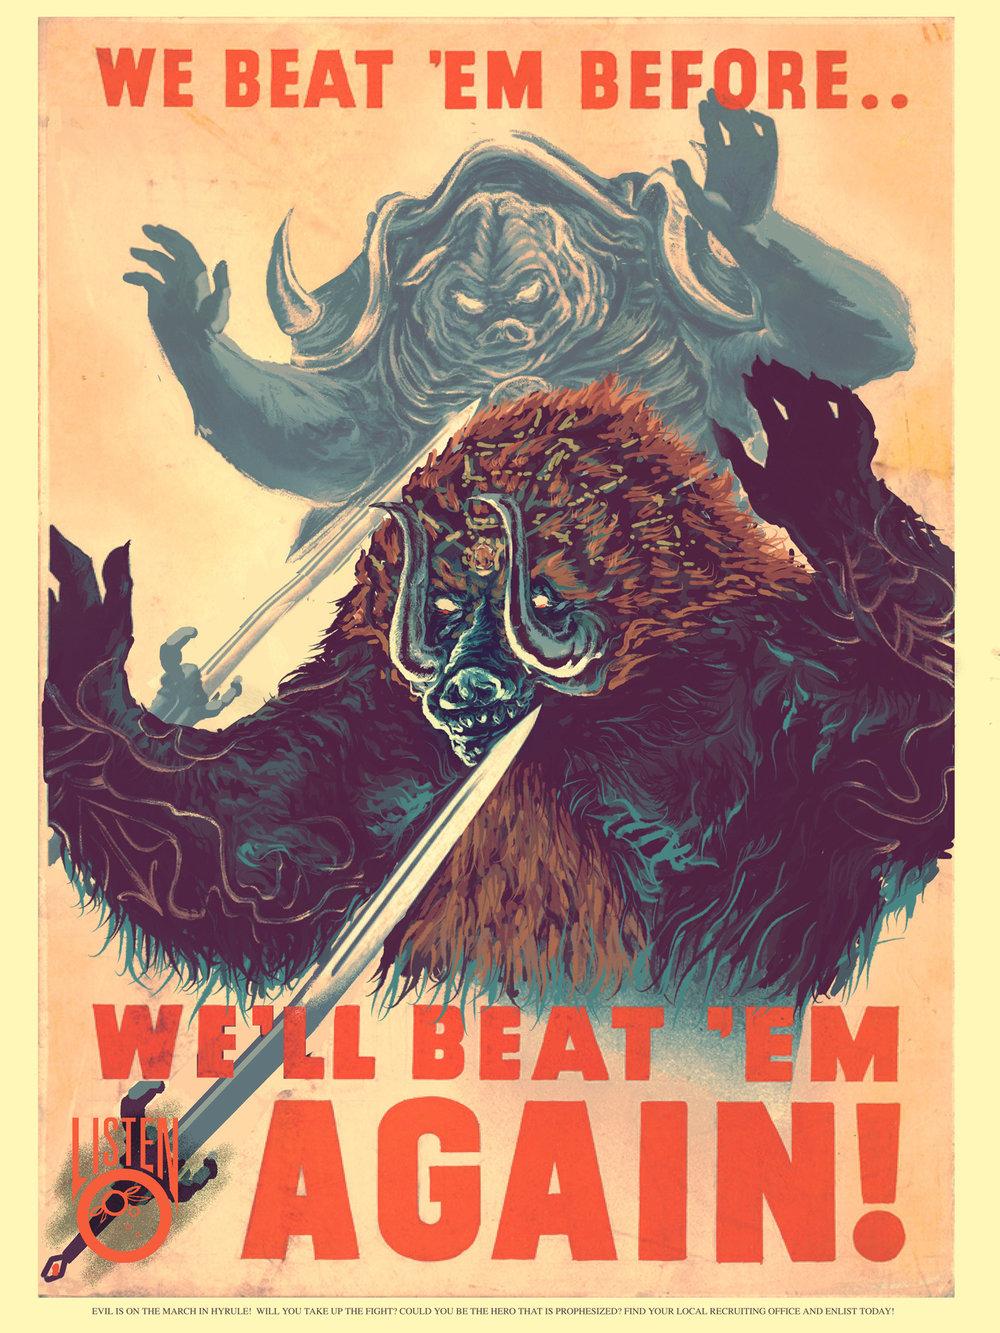 zelda propaganda posters boing boing